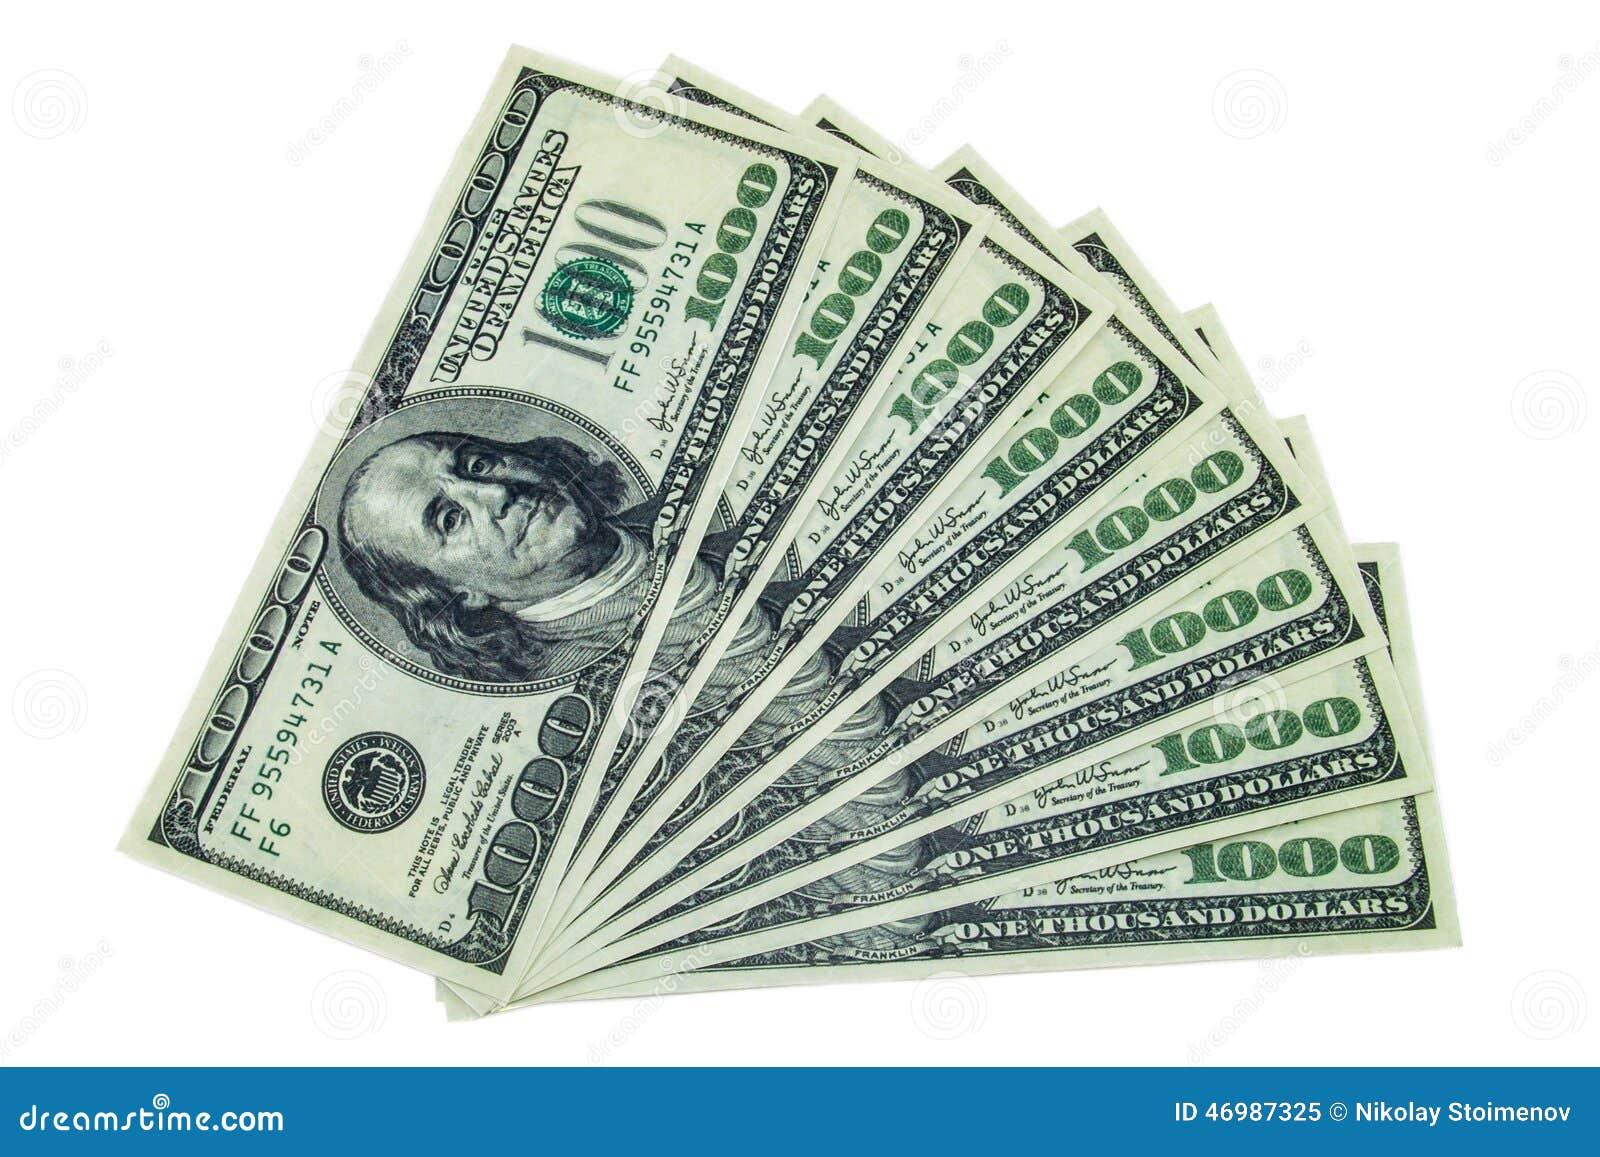 Old 100 dollar bills hot girls wallpaper for 200 thousand dollar homes